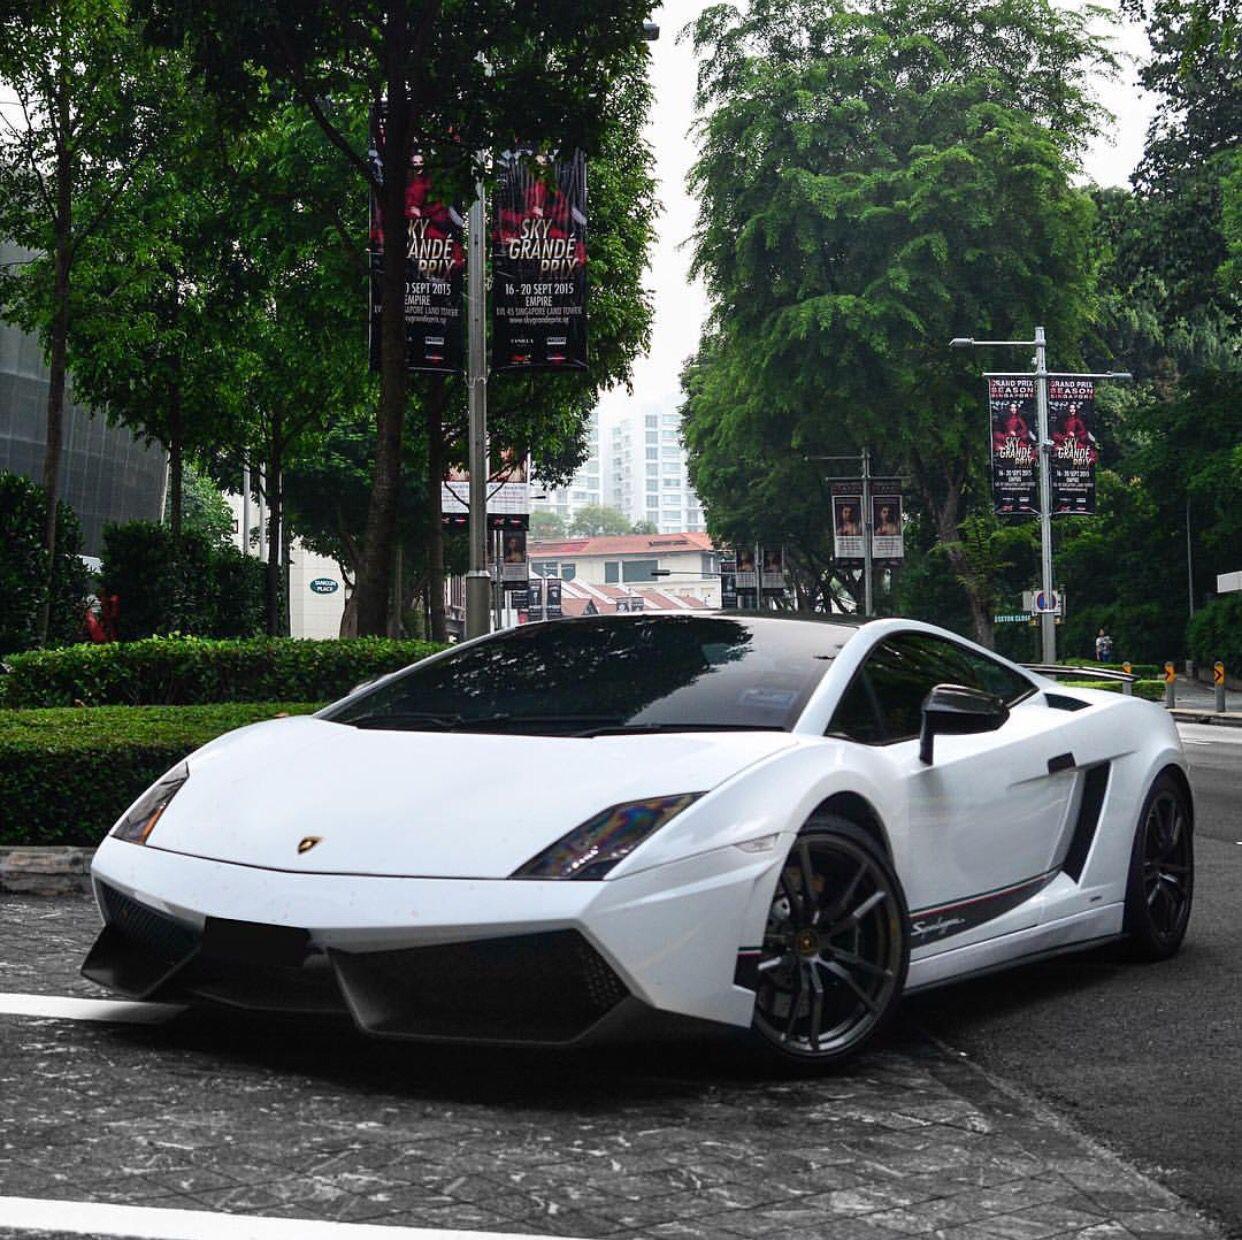 Lamborghini Gallardo Lp570 4 Superleggera Painted In Bianco